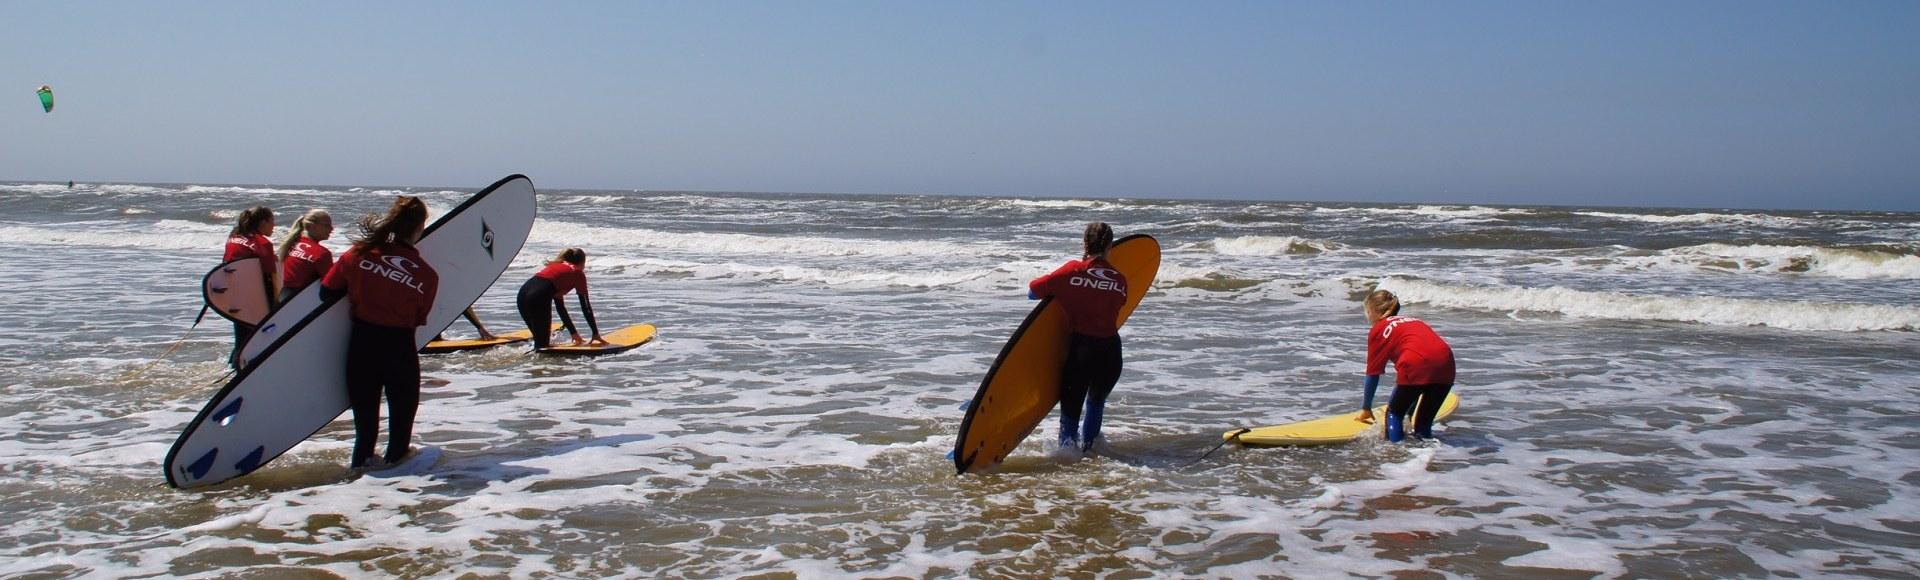 Surfplank stalling Bloemendaal